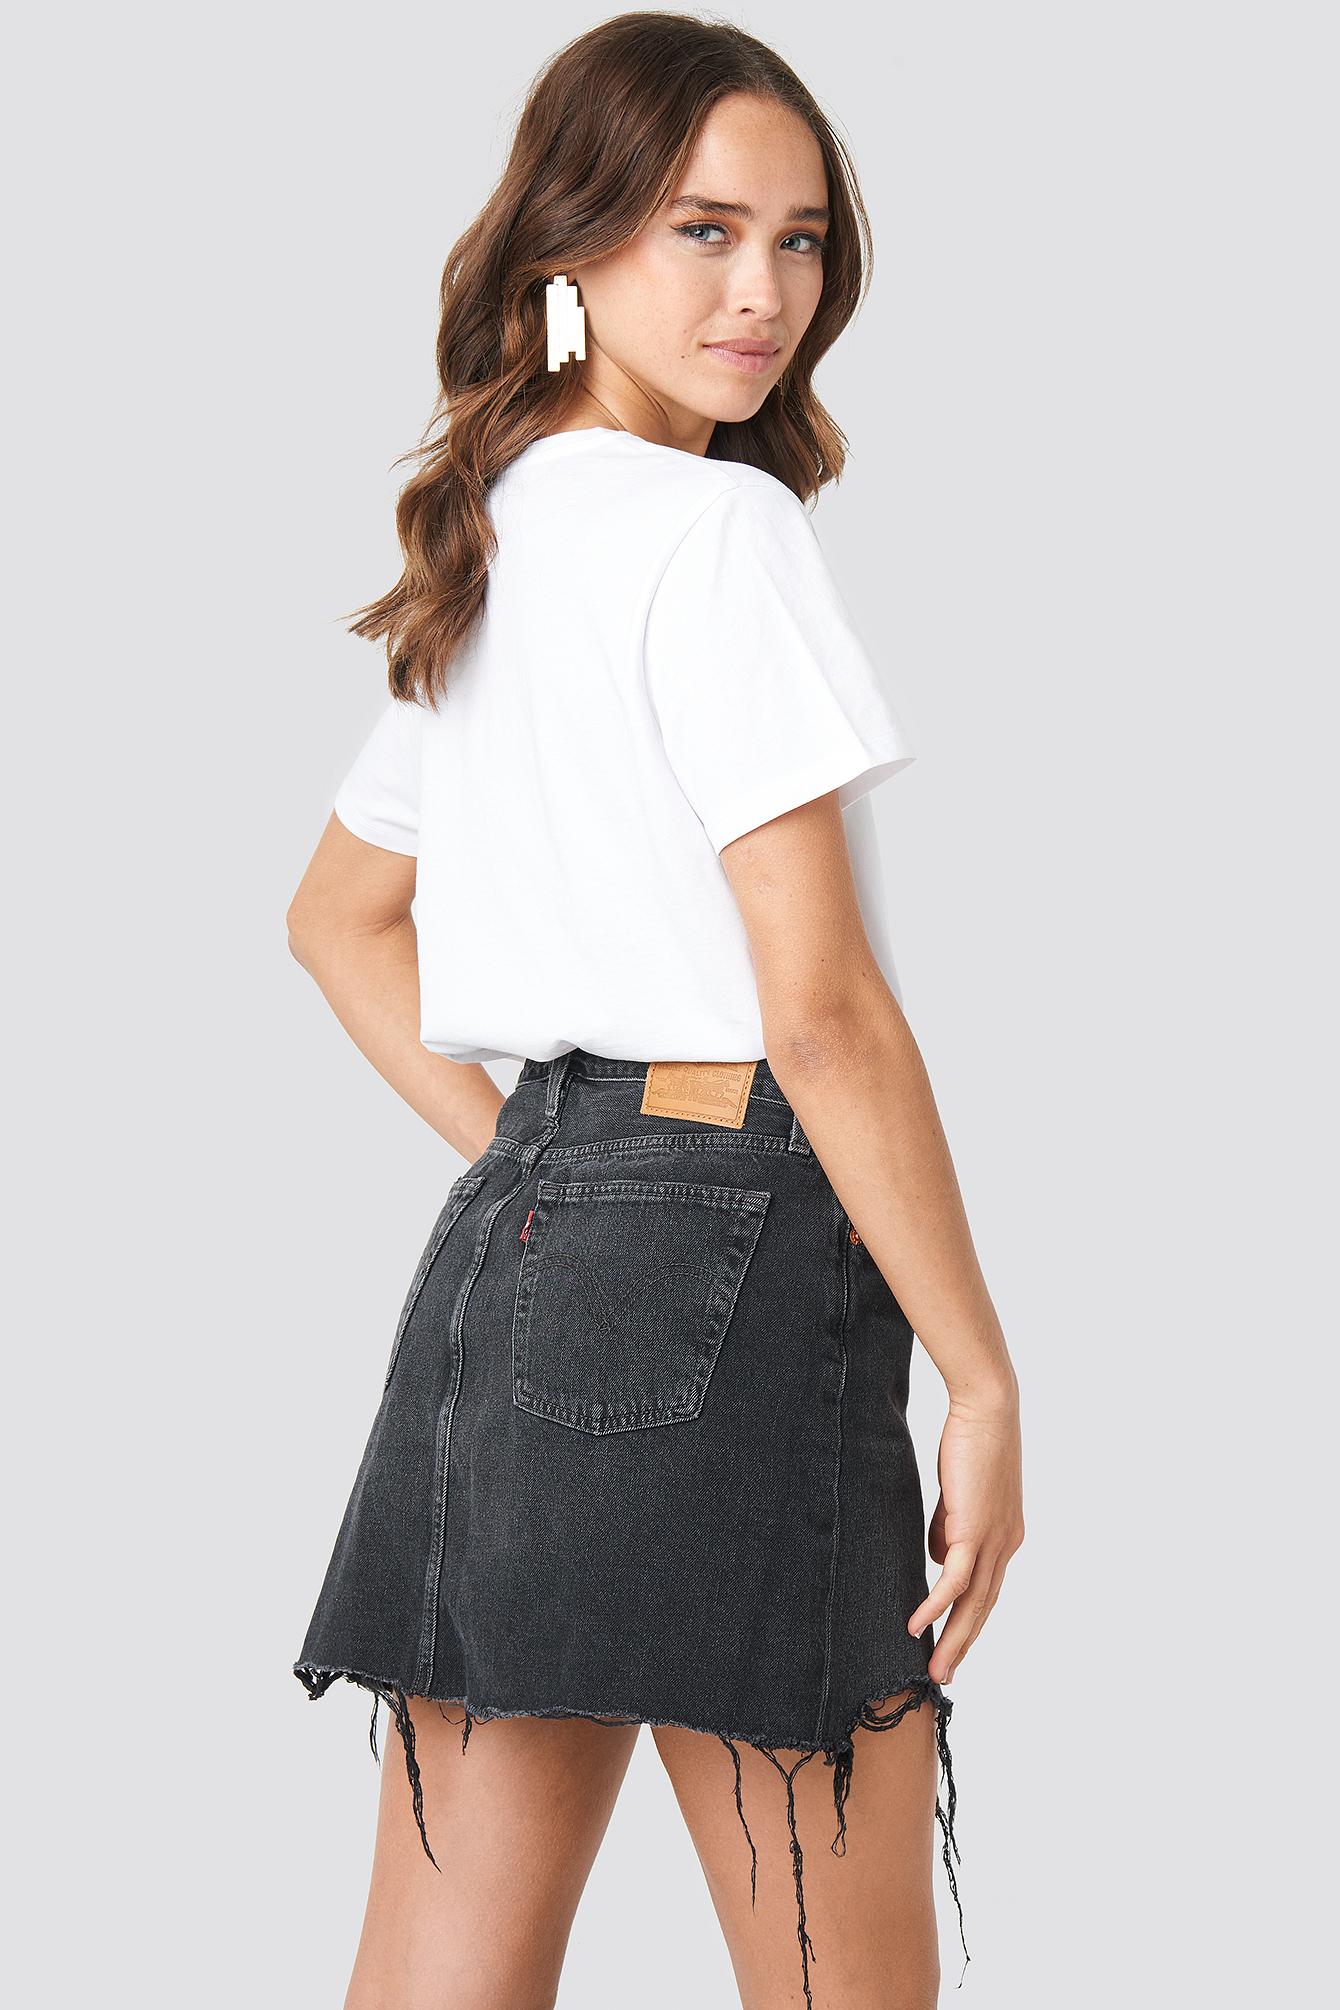 levi's -  Deconstructed Skirt - Black